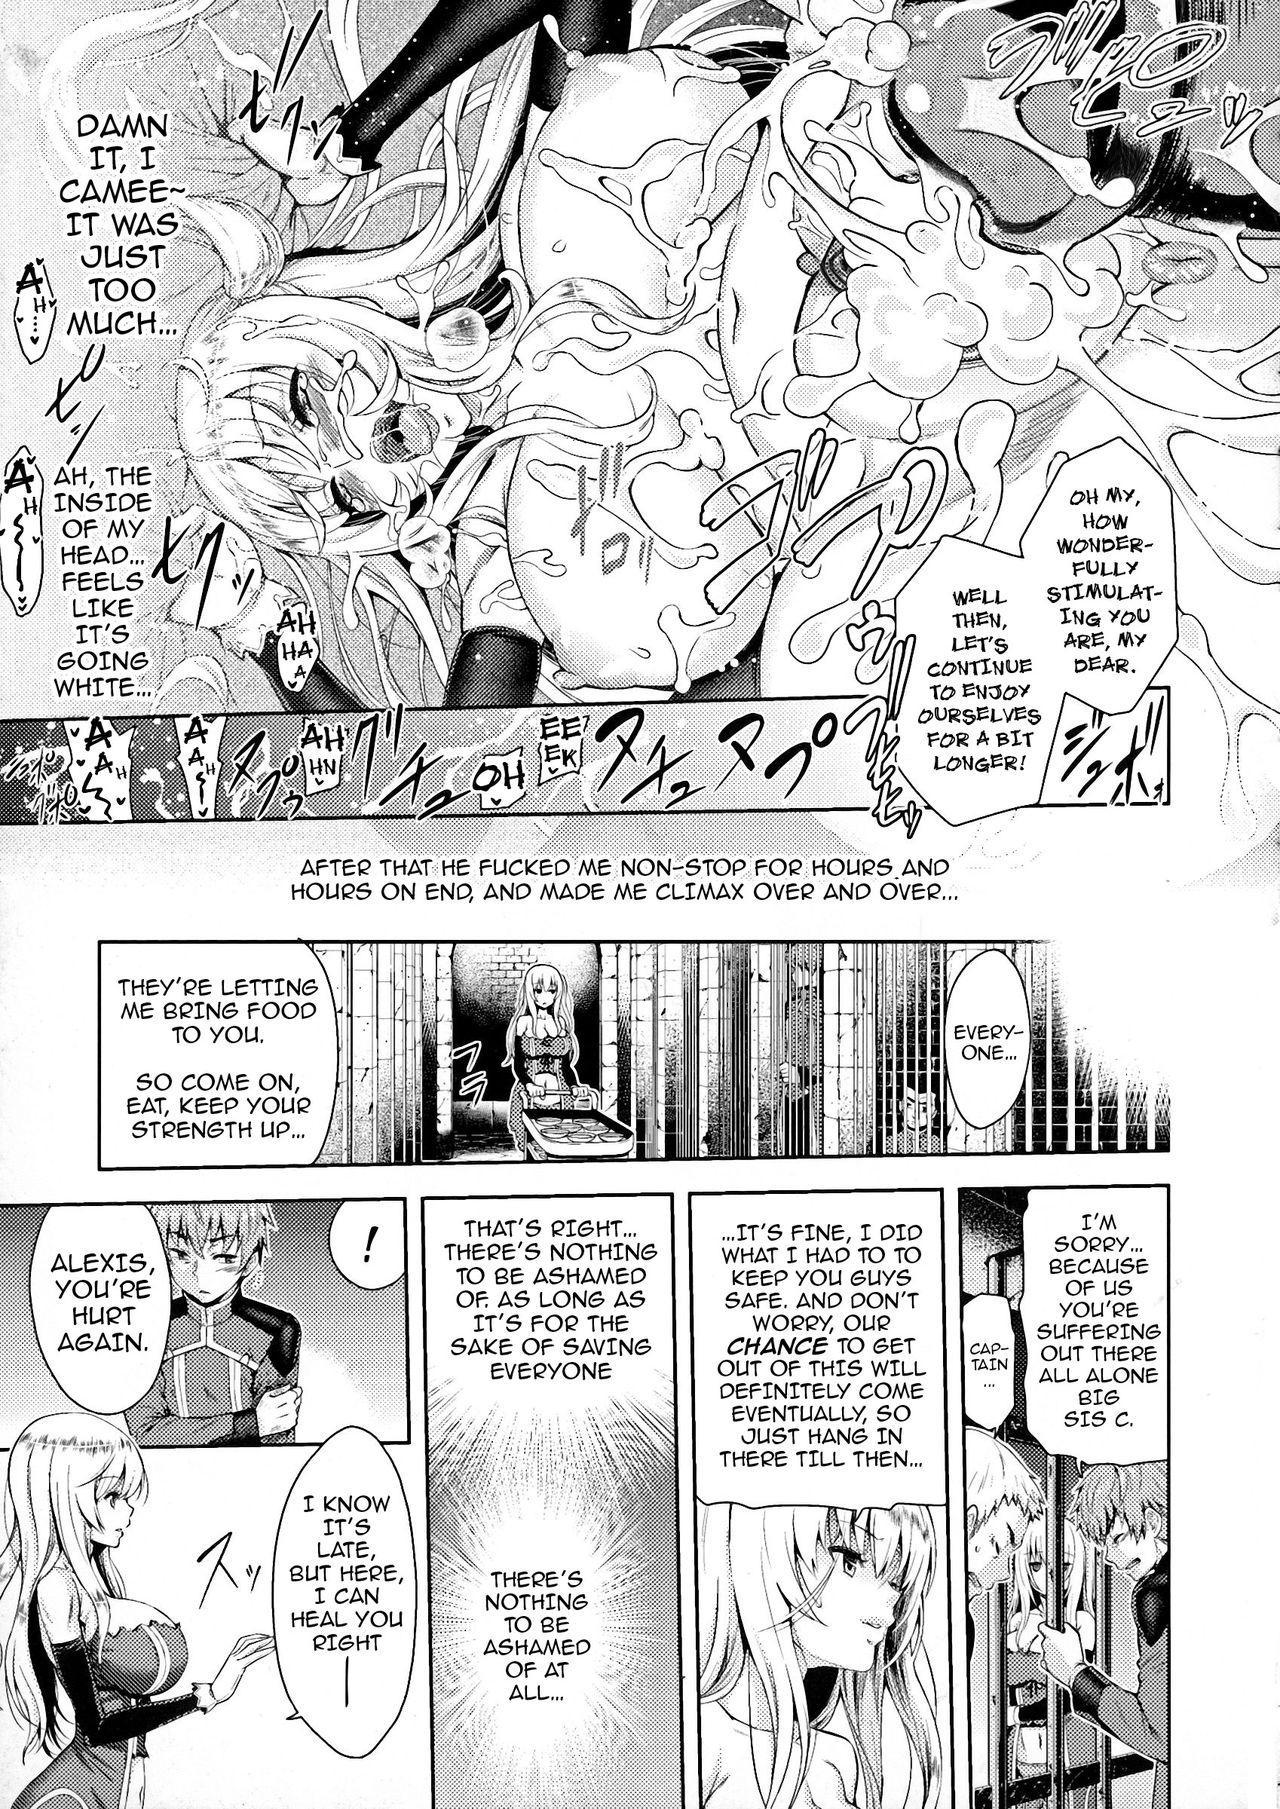 [Yamada Gogogo] Erona ~Orc no Inmon ni Okasareta Onna Kishi no Matsuro~ | Erona ~The Fall of a Beautiful Knight Cursed with the Lewd Mark of an Orc~ Ch. 1-6 [English] [darknight] [Decensored] [ongoing] 22